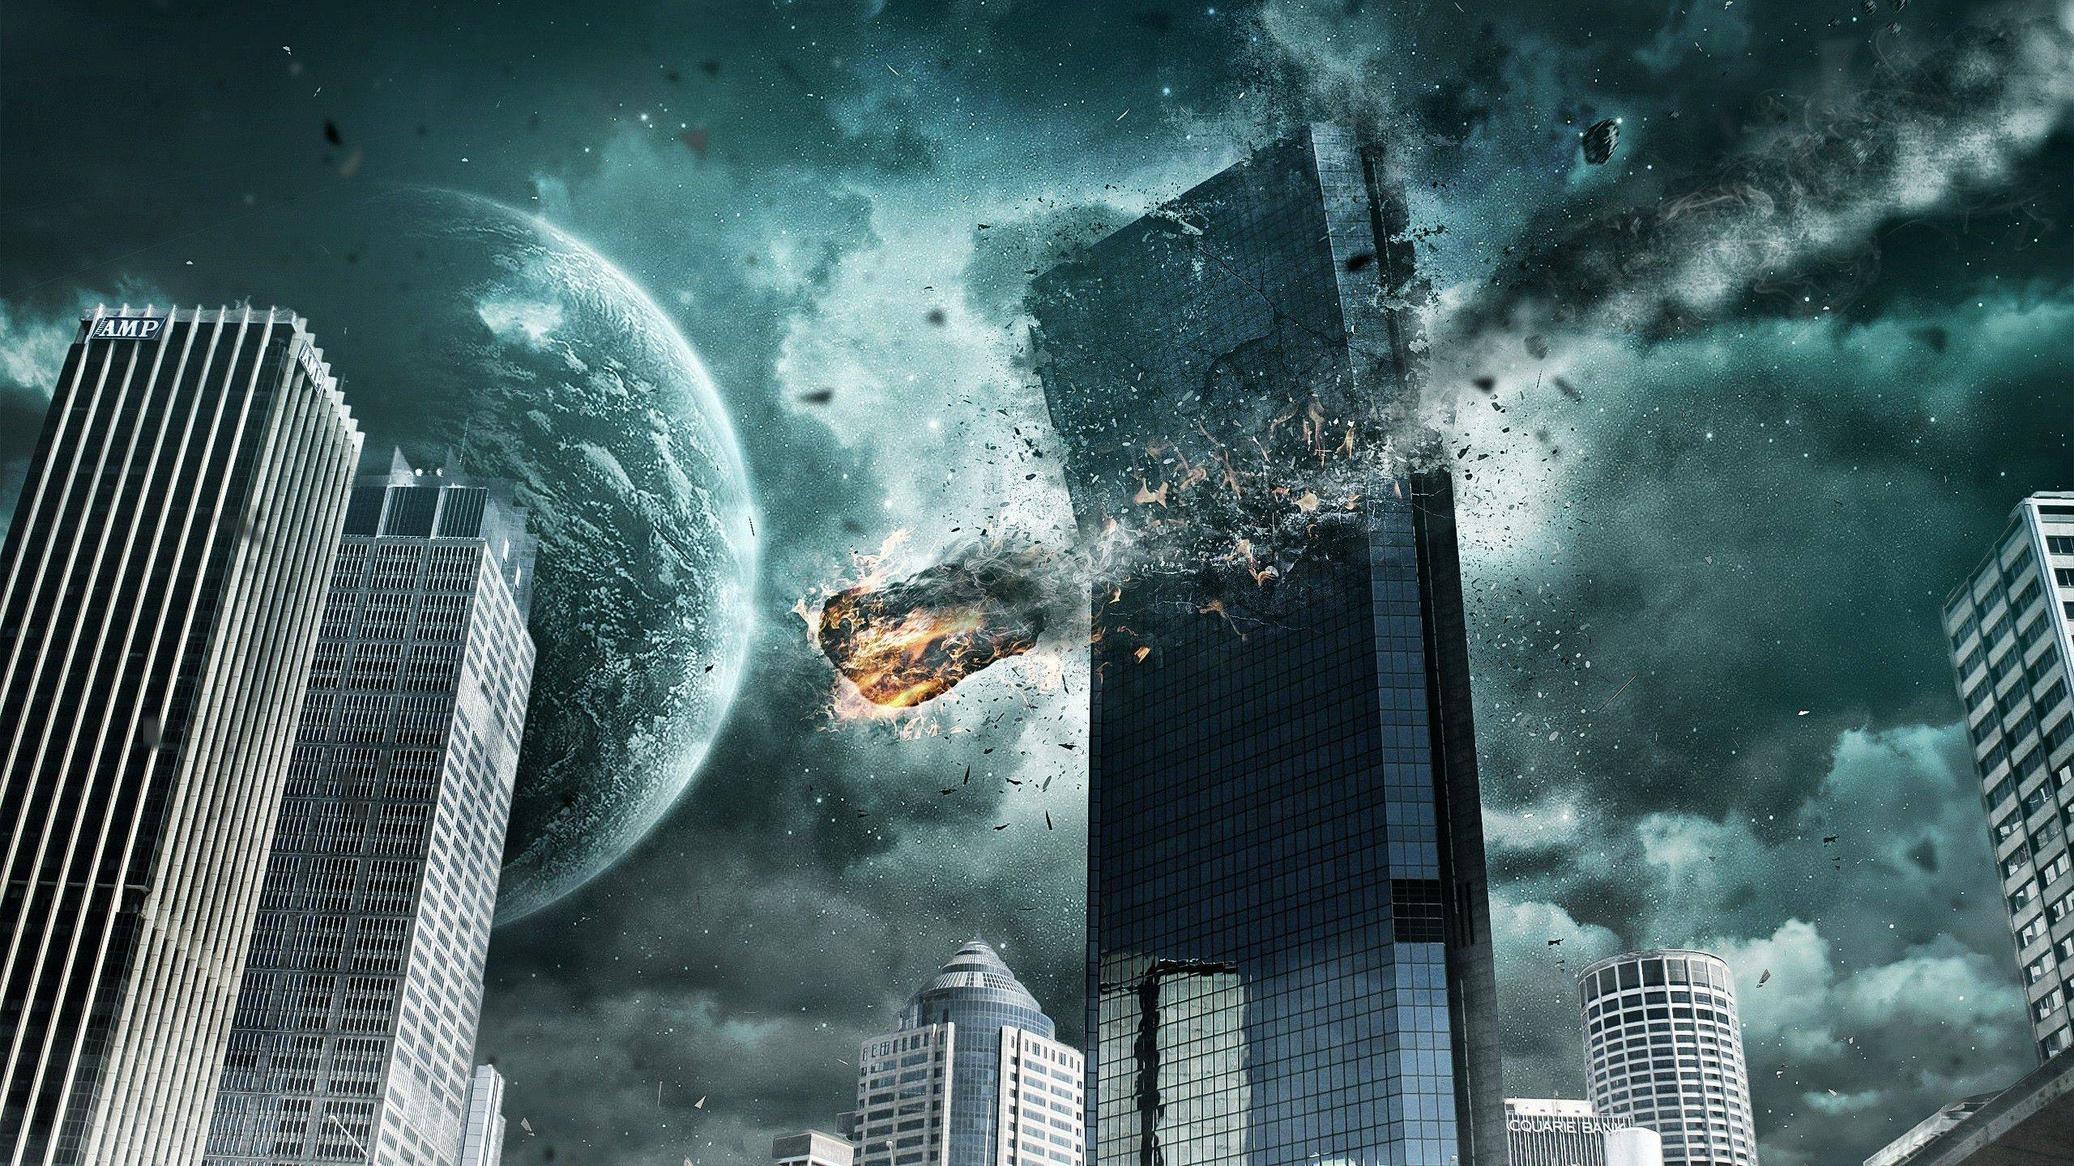 cityscape skyscraper metropolis disaster darkness screenshot computer wallpaper atmosphere of earth 2074x1166 px